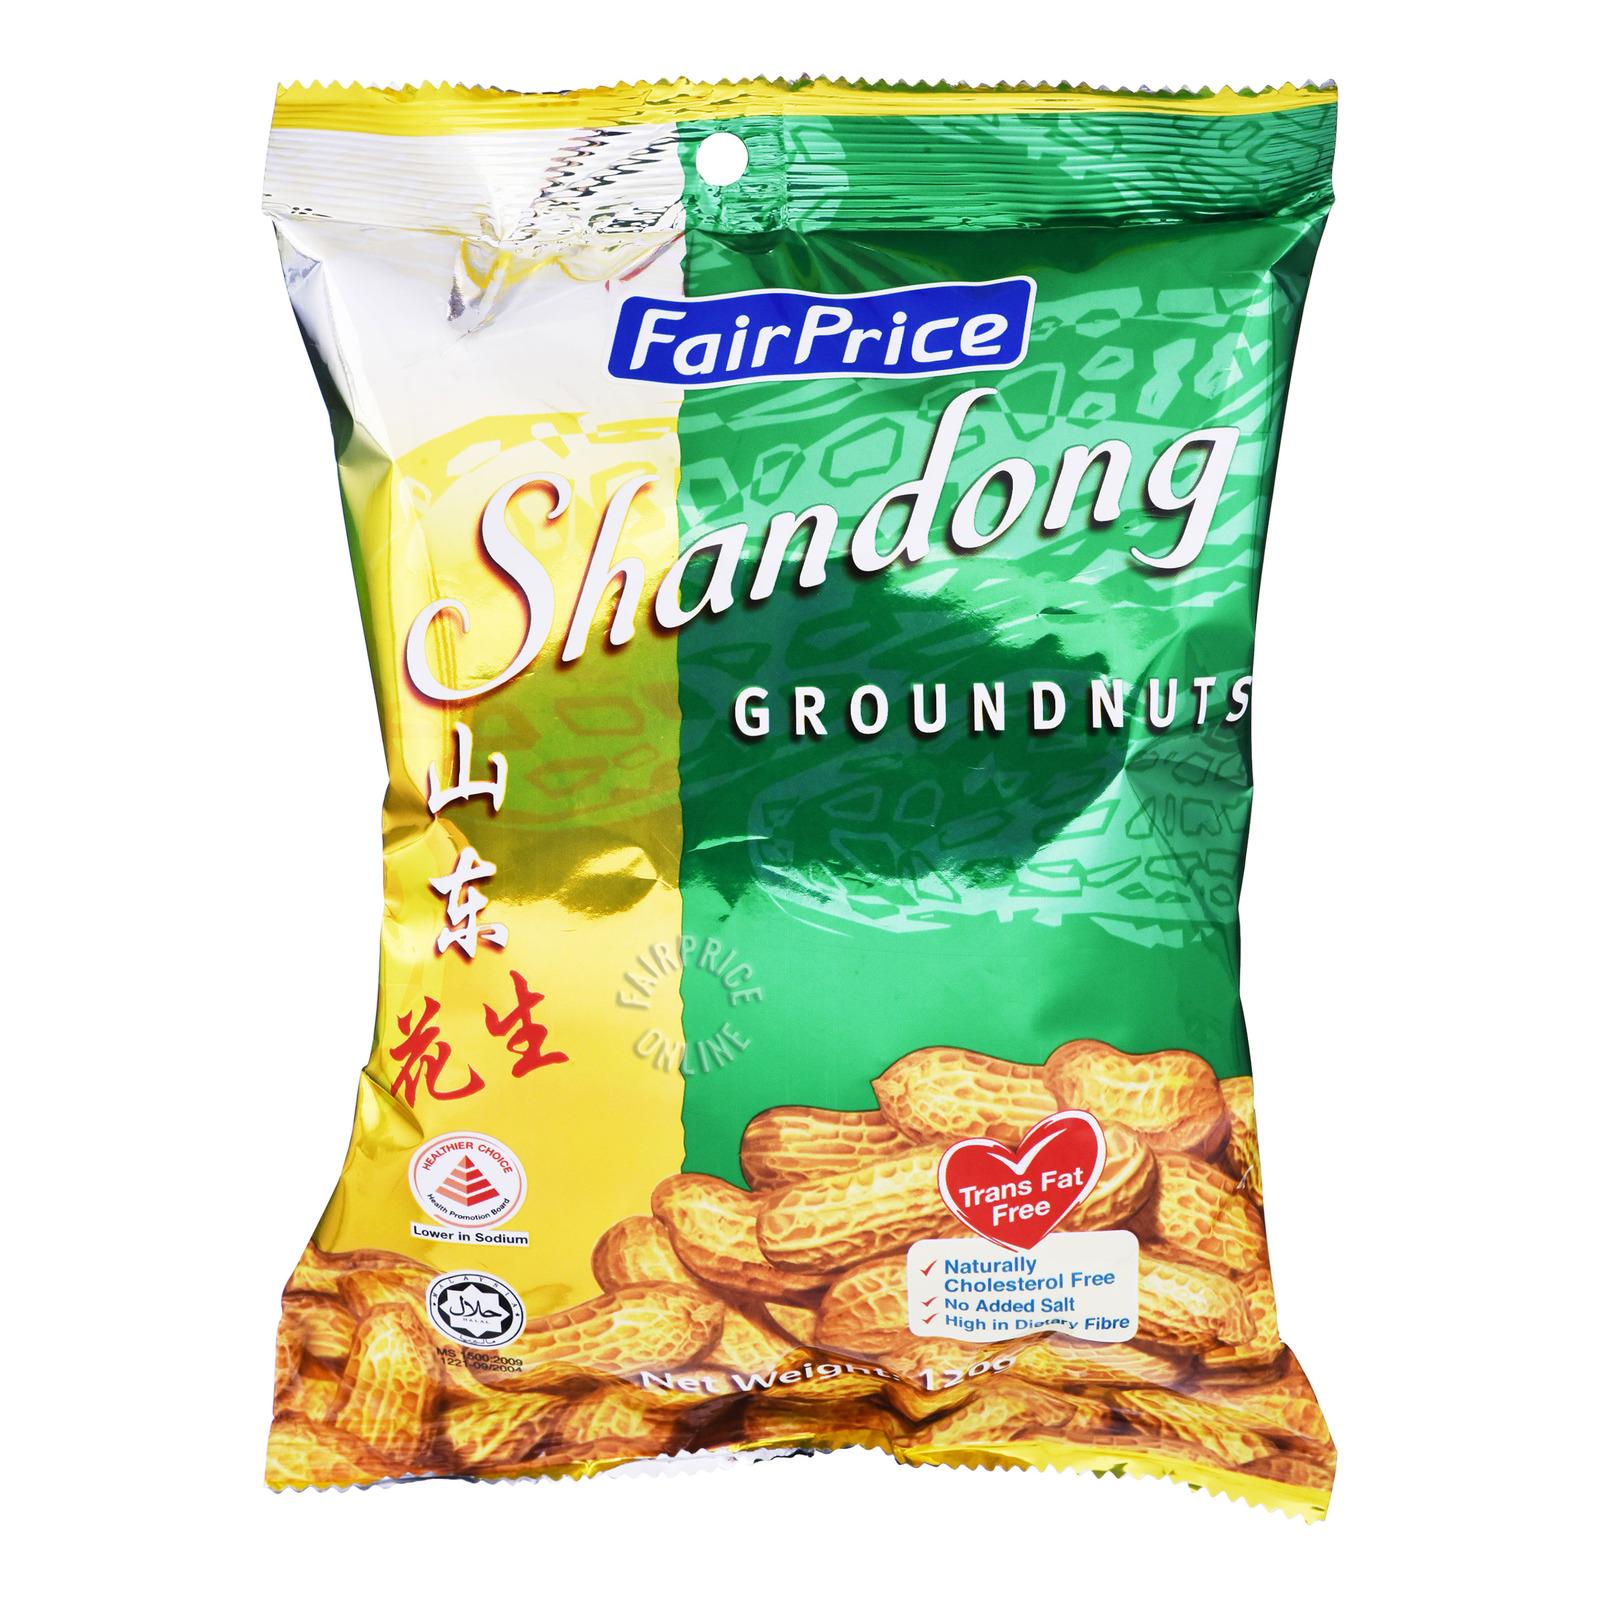 FairPrice Groundnuts - Shandong